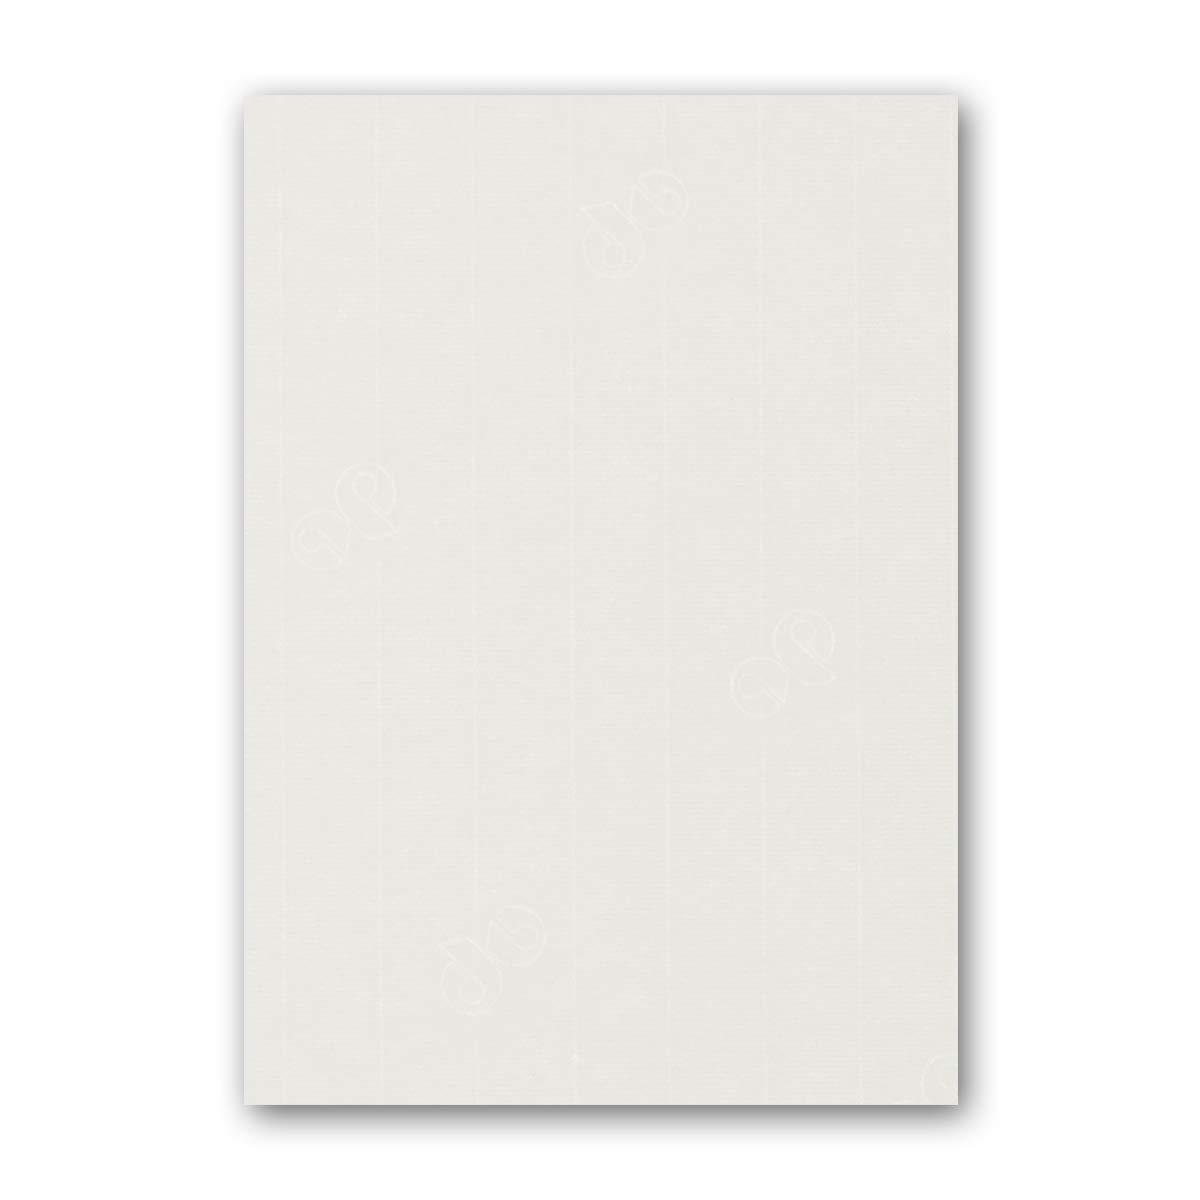 ARTOZ 150x Briefpapier + Bastelpapier Bastelkarton - Taupe - DIN A4 297 x 210 mm – Edle Egoutteur-Rippung – Hochwertiges 220 g m² Tonpapier – Scrapbooking Papier 240 - Ivory-Elfenbein 100 Stück